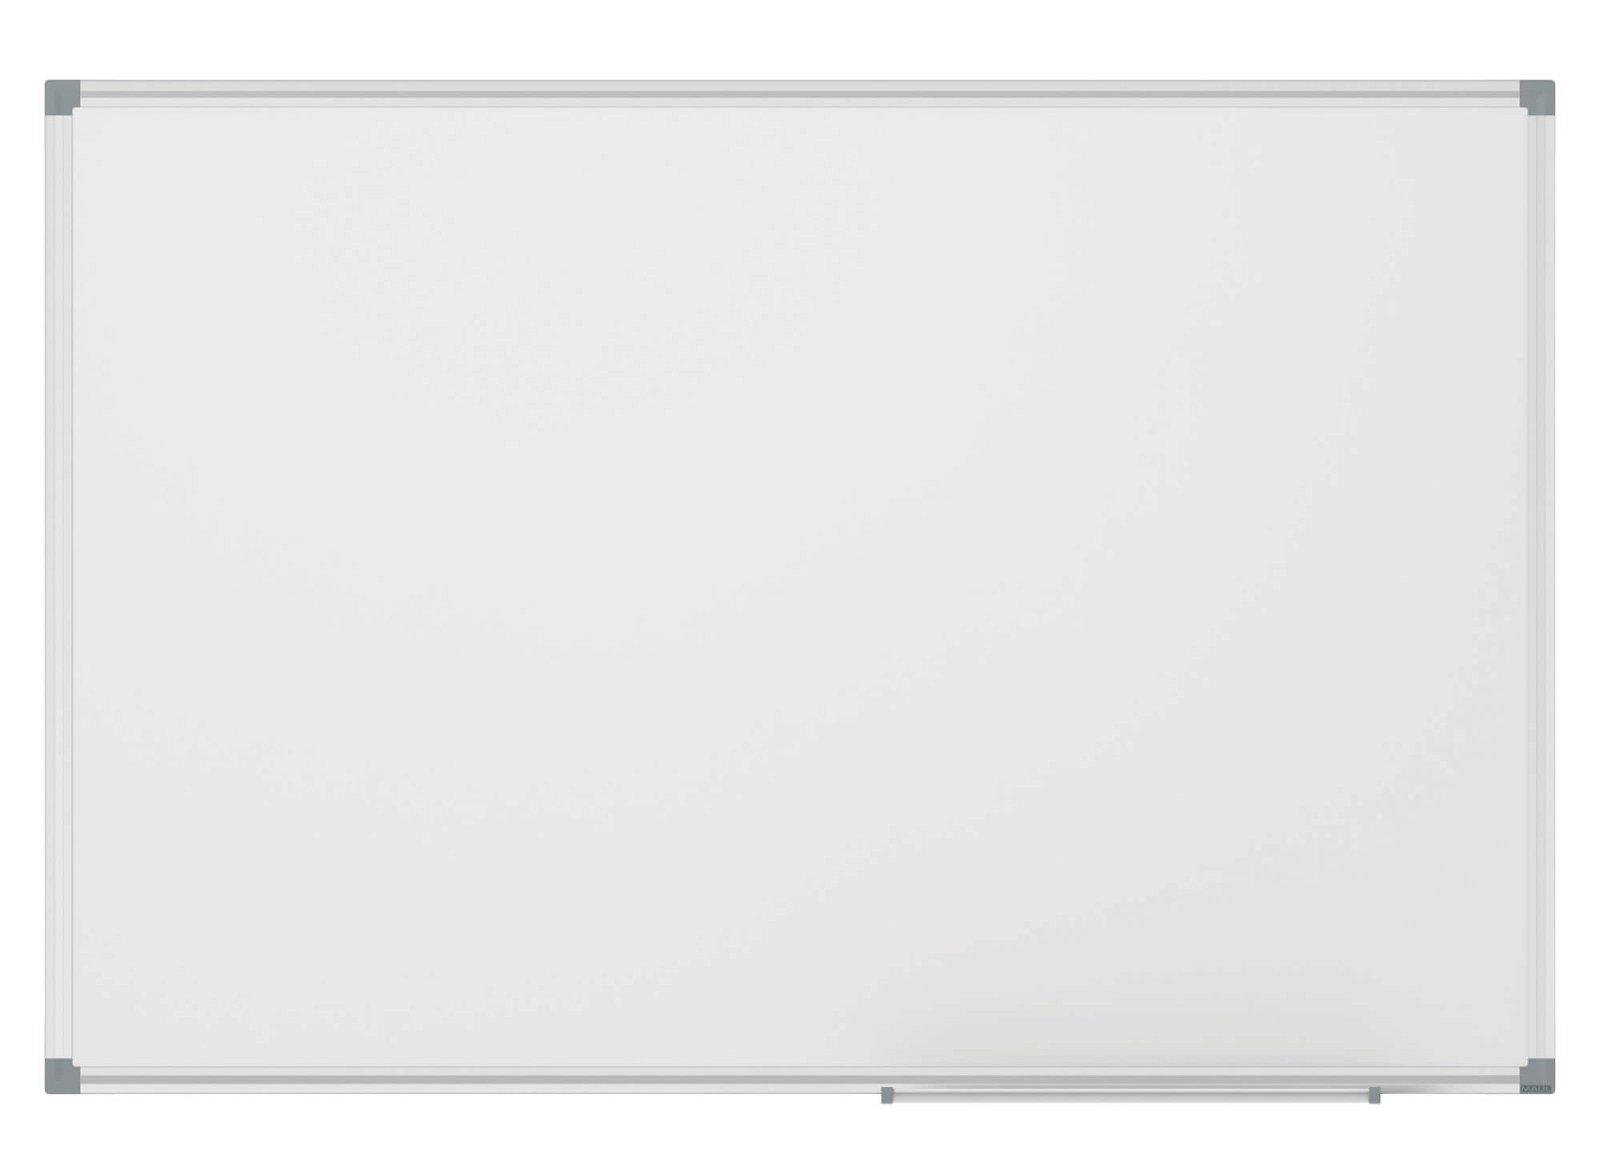 Whiteboard MAULstandard, 100x200 cm, grau